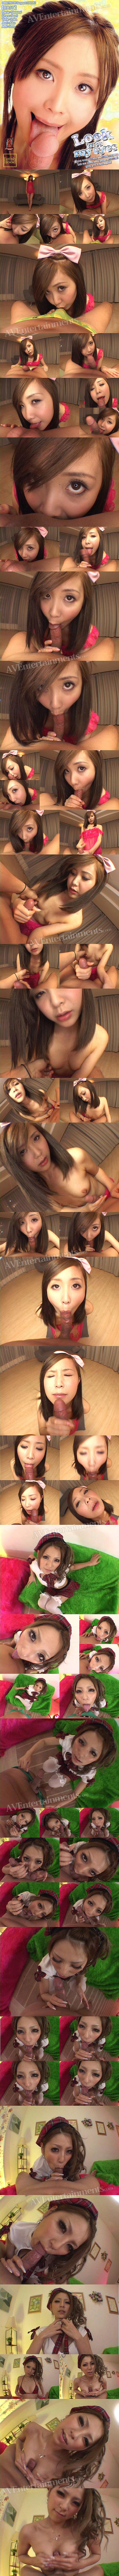 [FH 36] Look into My Eyes Yurie Iruka Urara Saori Marie Natsumi Look into My Eyes FH Anri Aiko Ami Sora